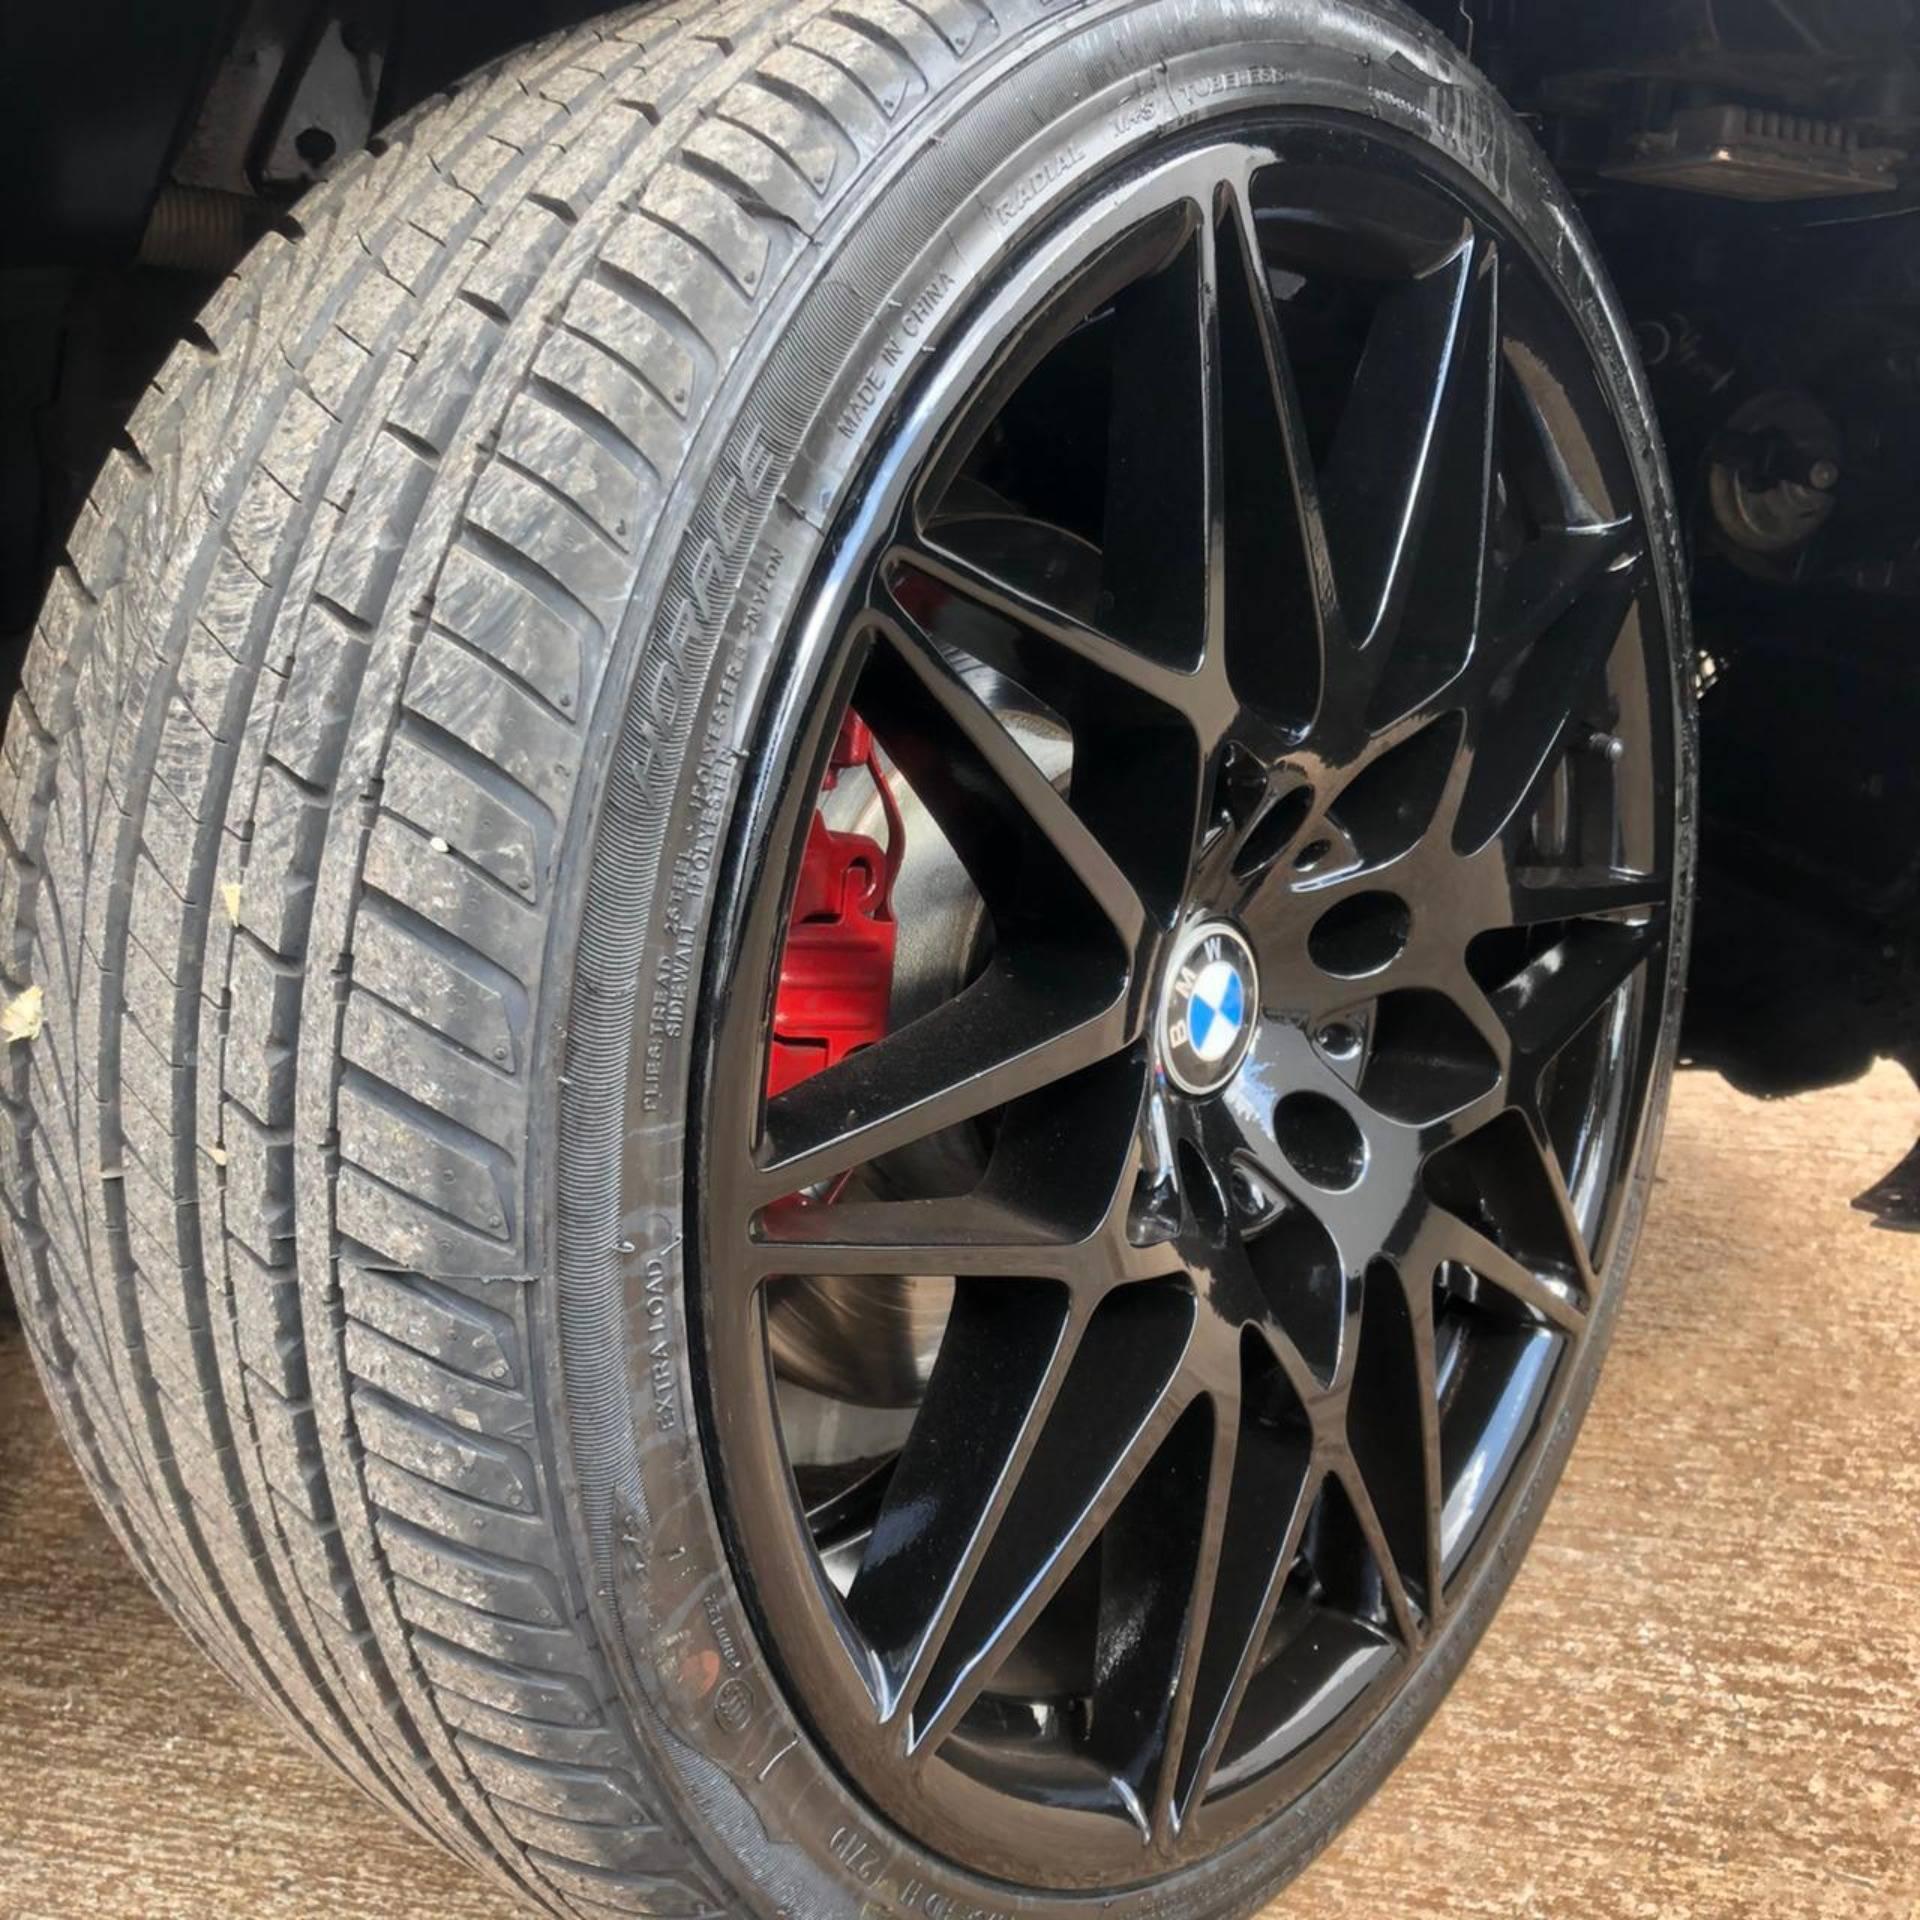 BMW X1 2.0 16V 4P S DRIVE 18I AUTOMÁTICO, Foto 3